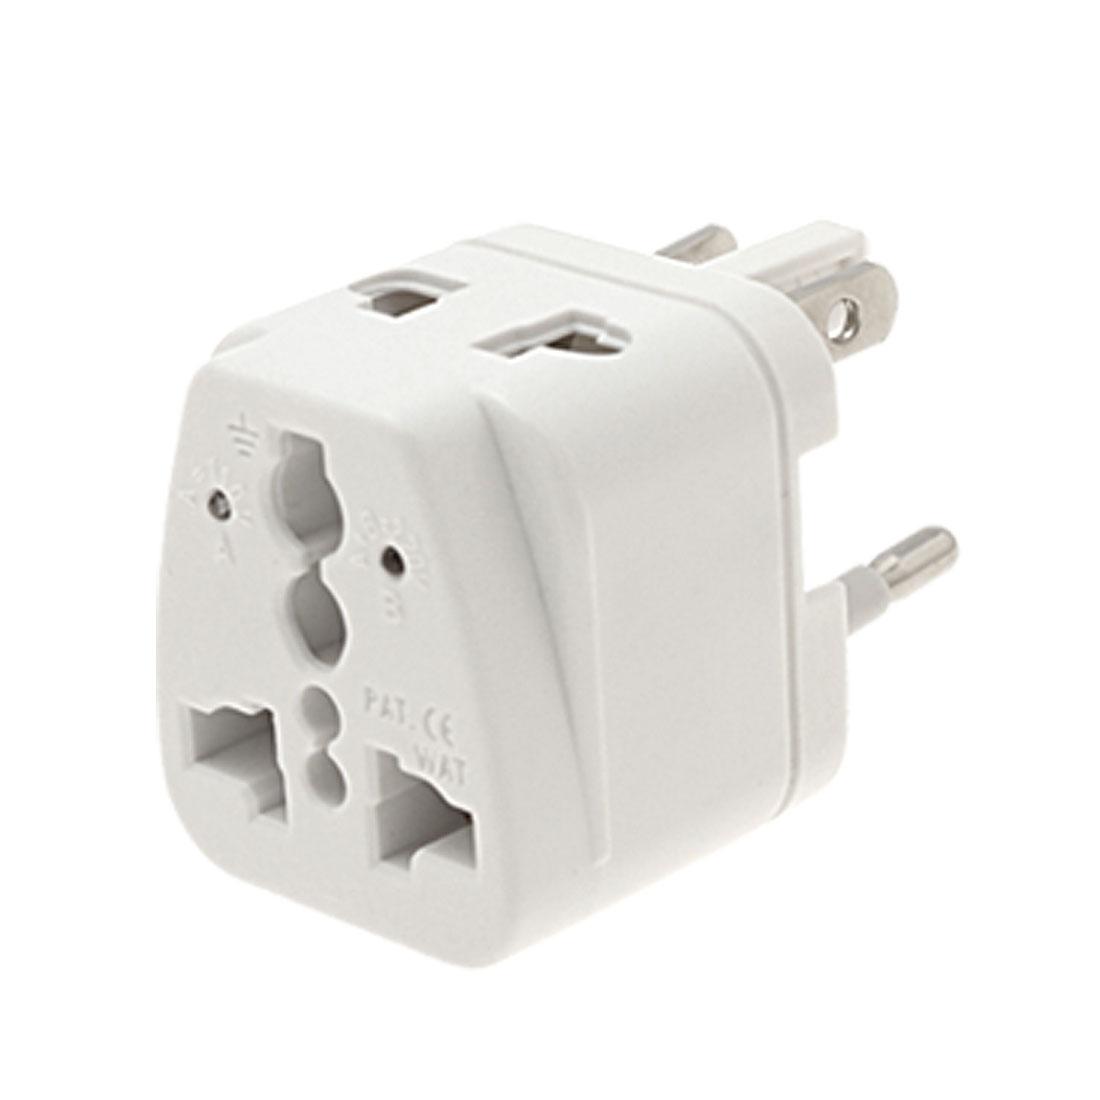 10A 250V US EU Plug Mini Global Travel Adapter Charger